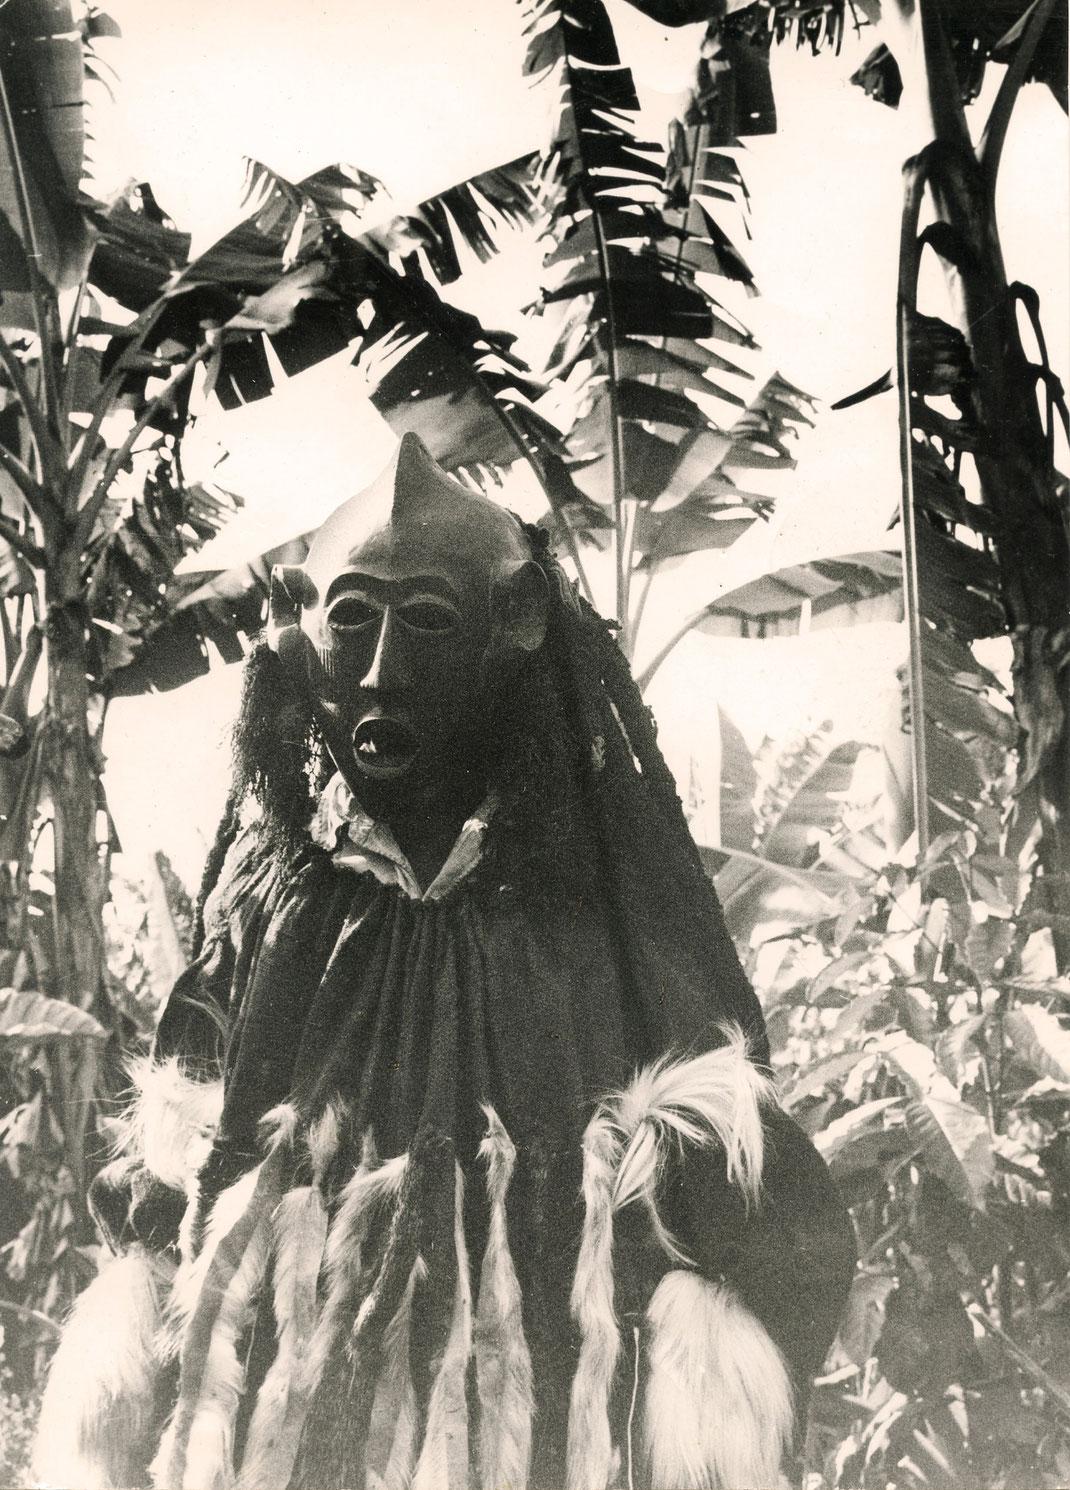 Kun'gan Mask, Bamileke, Cameroon, Field Photo with full mask robe under palm trees.